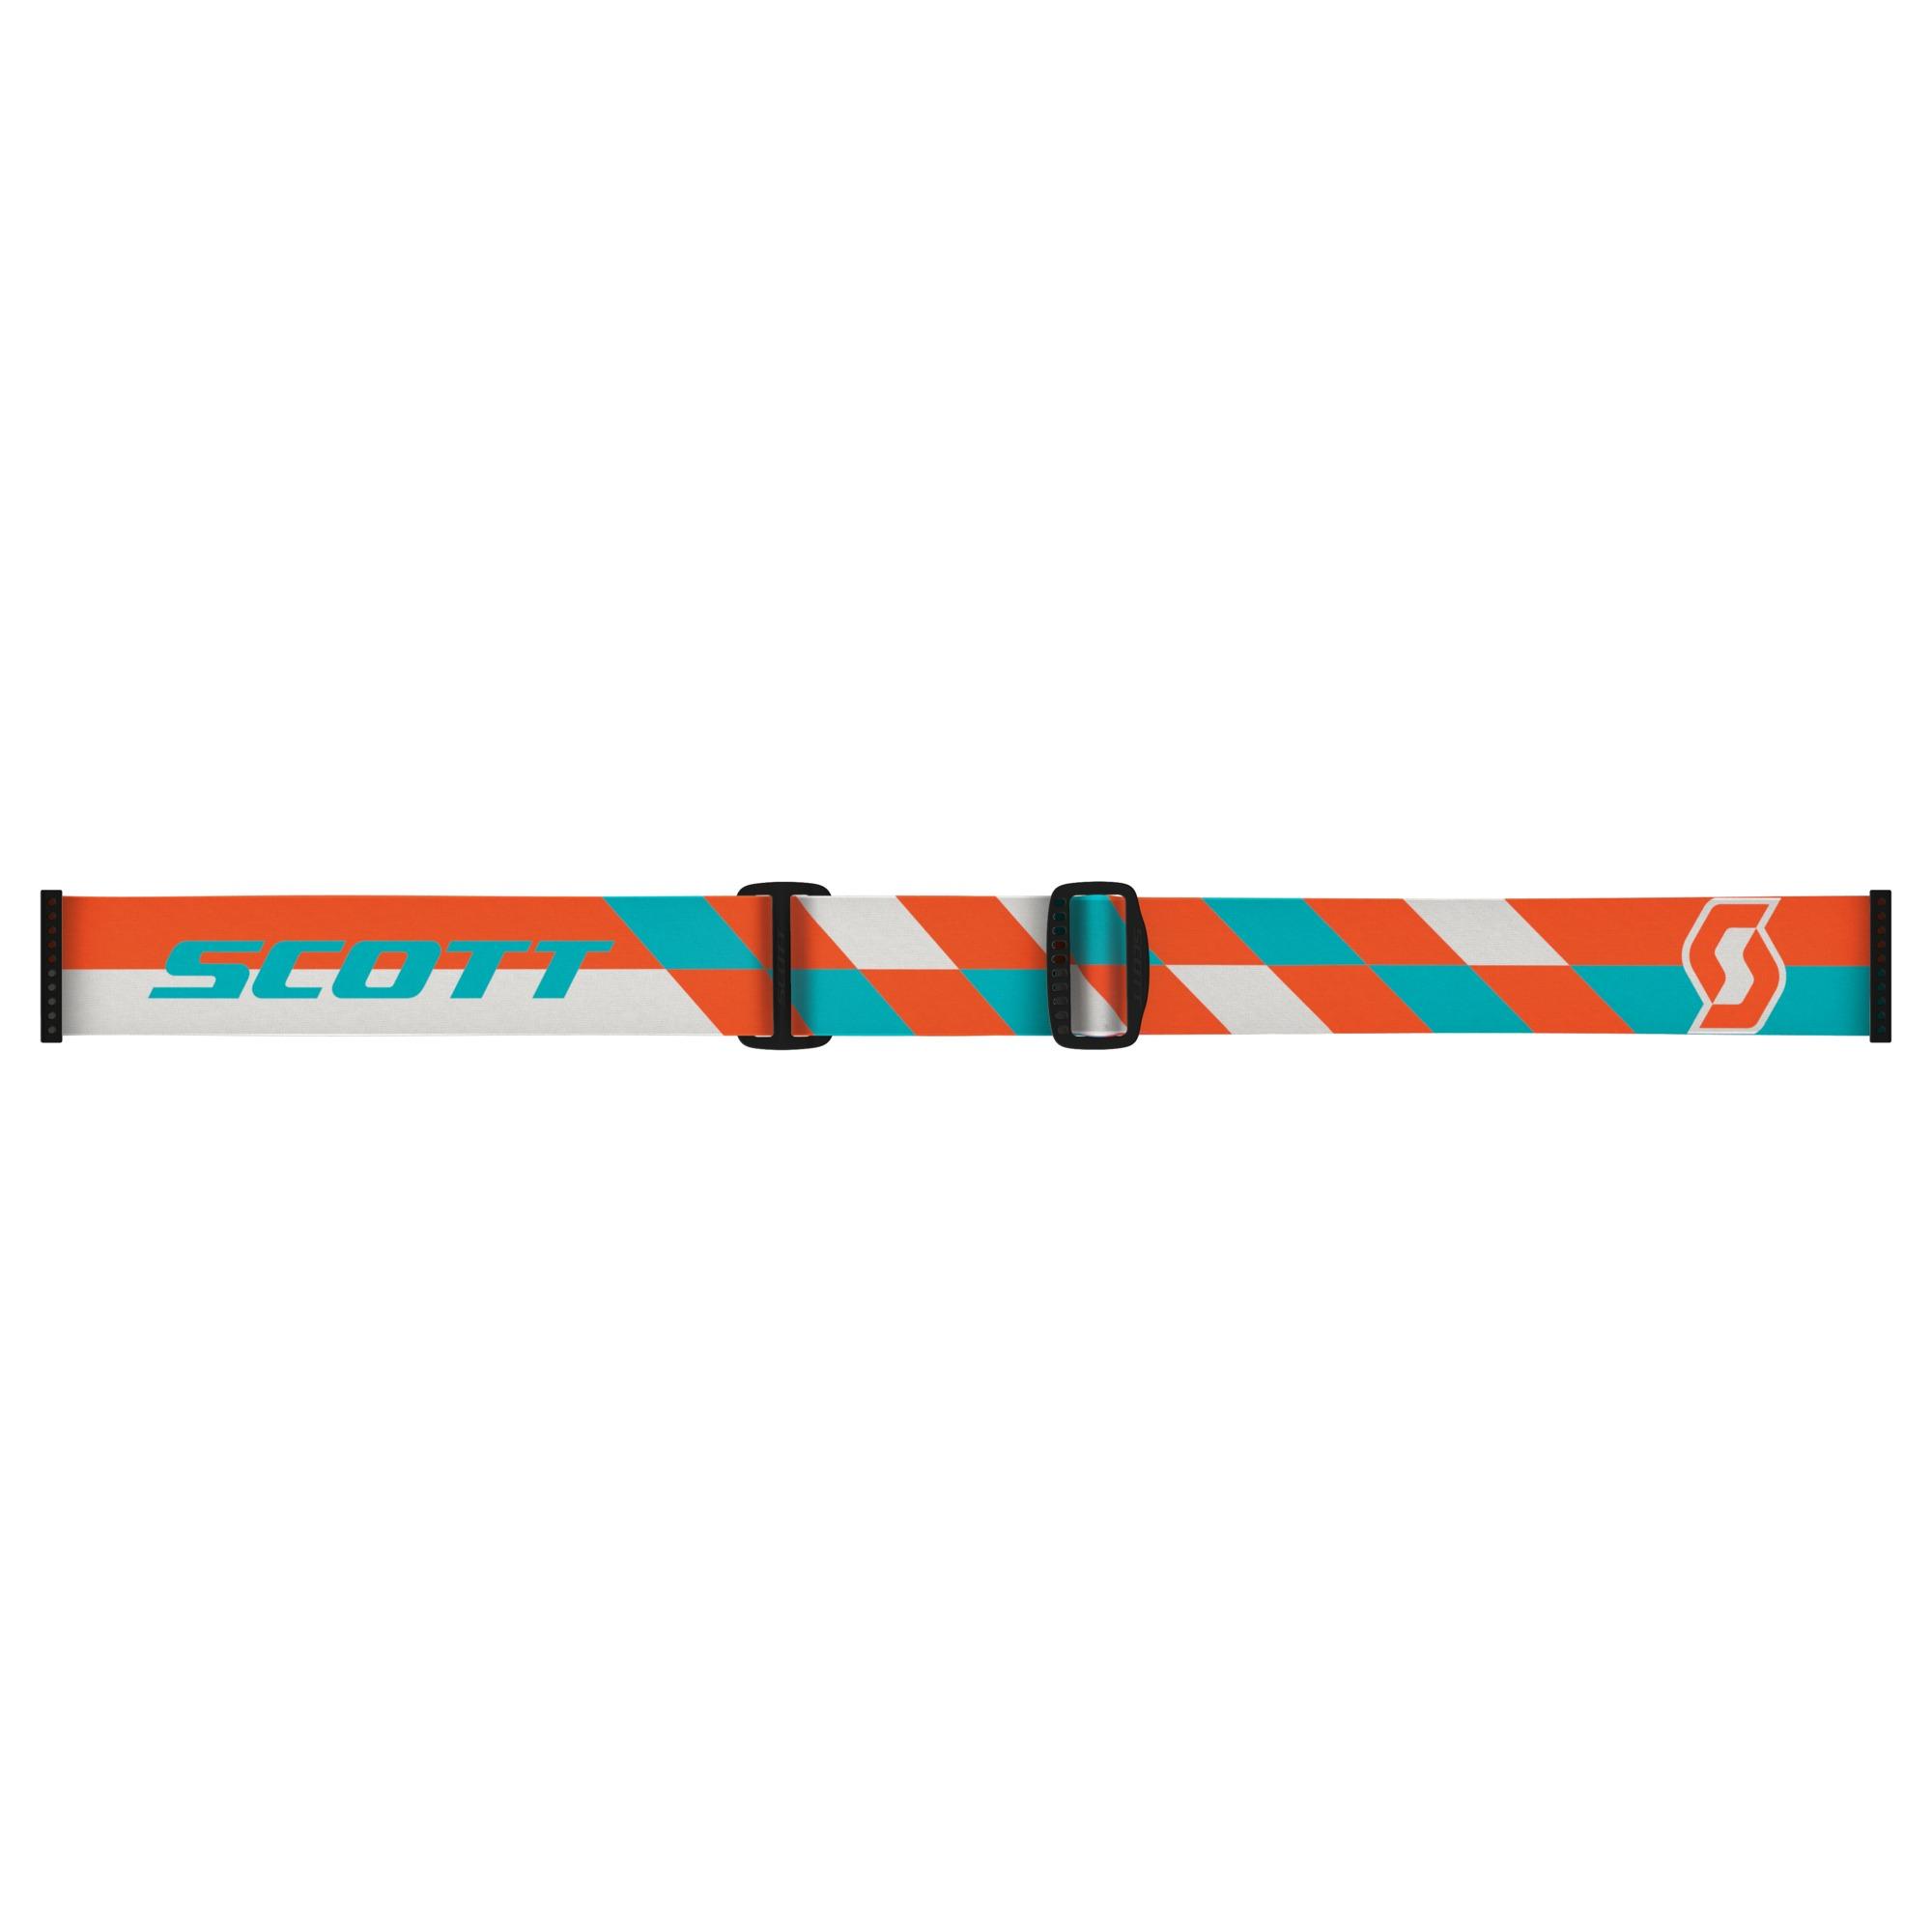 Scott Oxide Hustle MX cross goggles Orange Turquoise